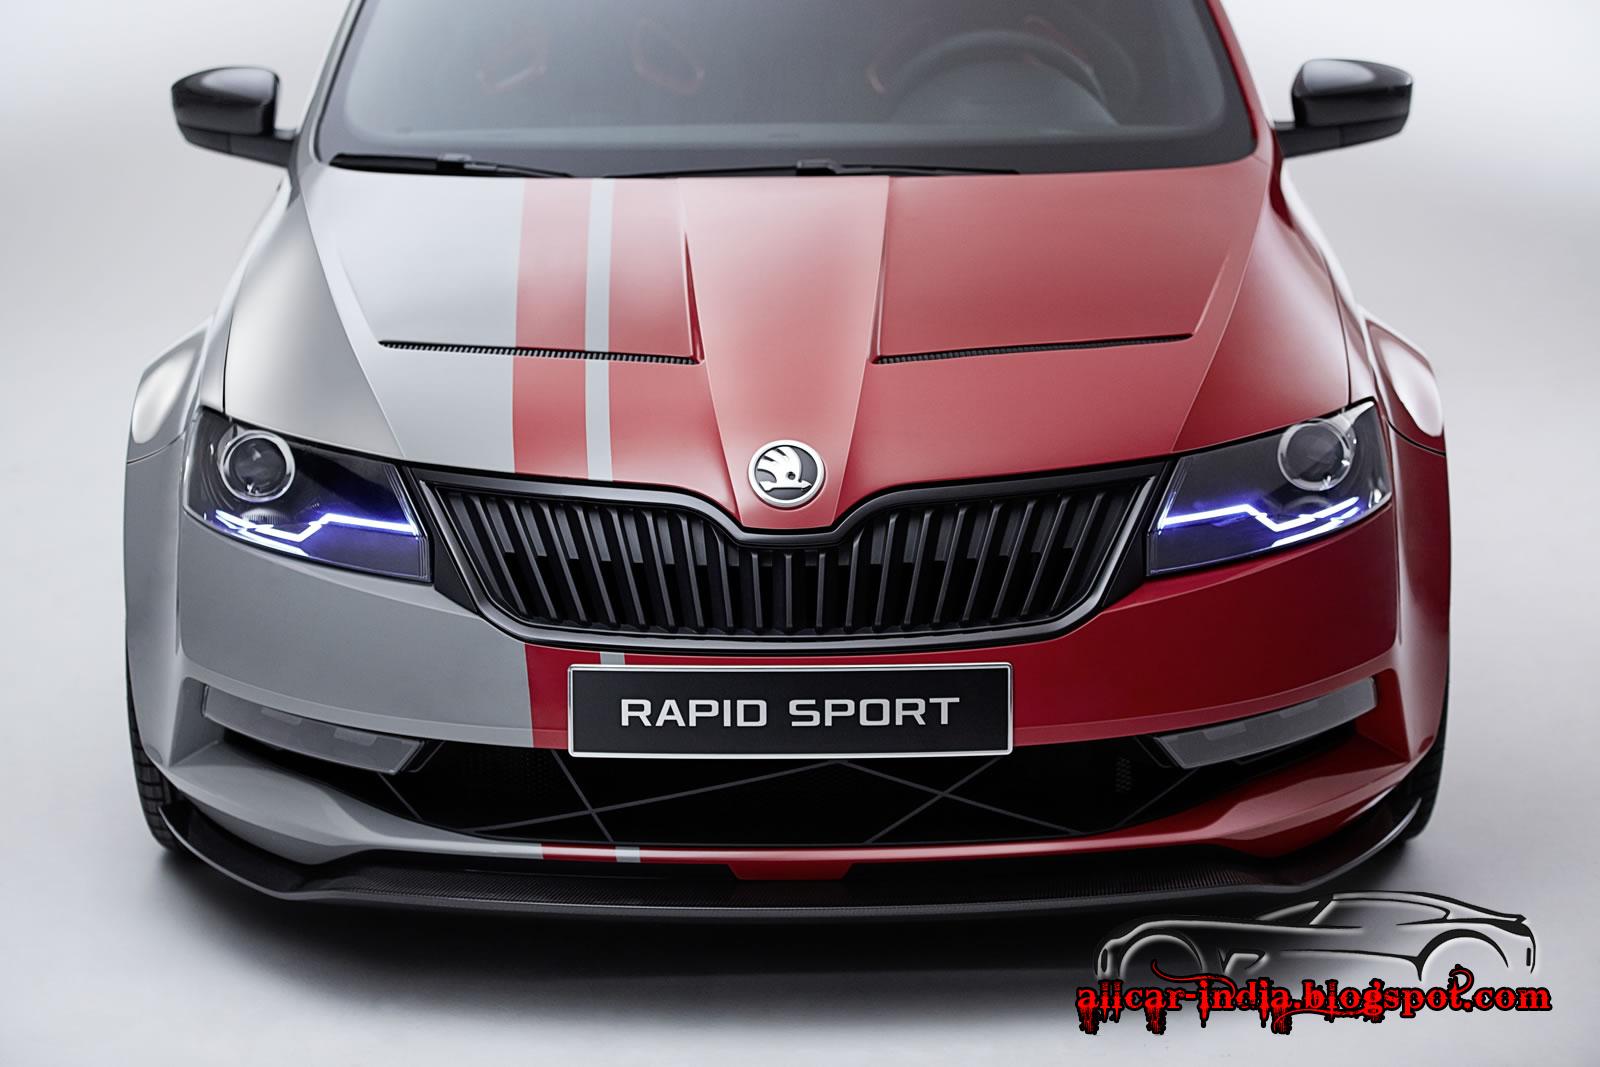 2013 Skoda Rapid Sport Coming Soon Slamber Nyowo